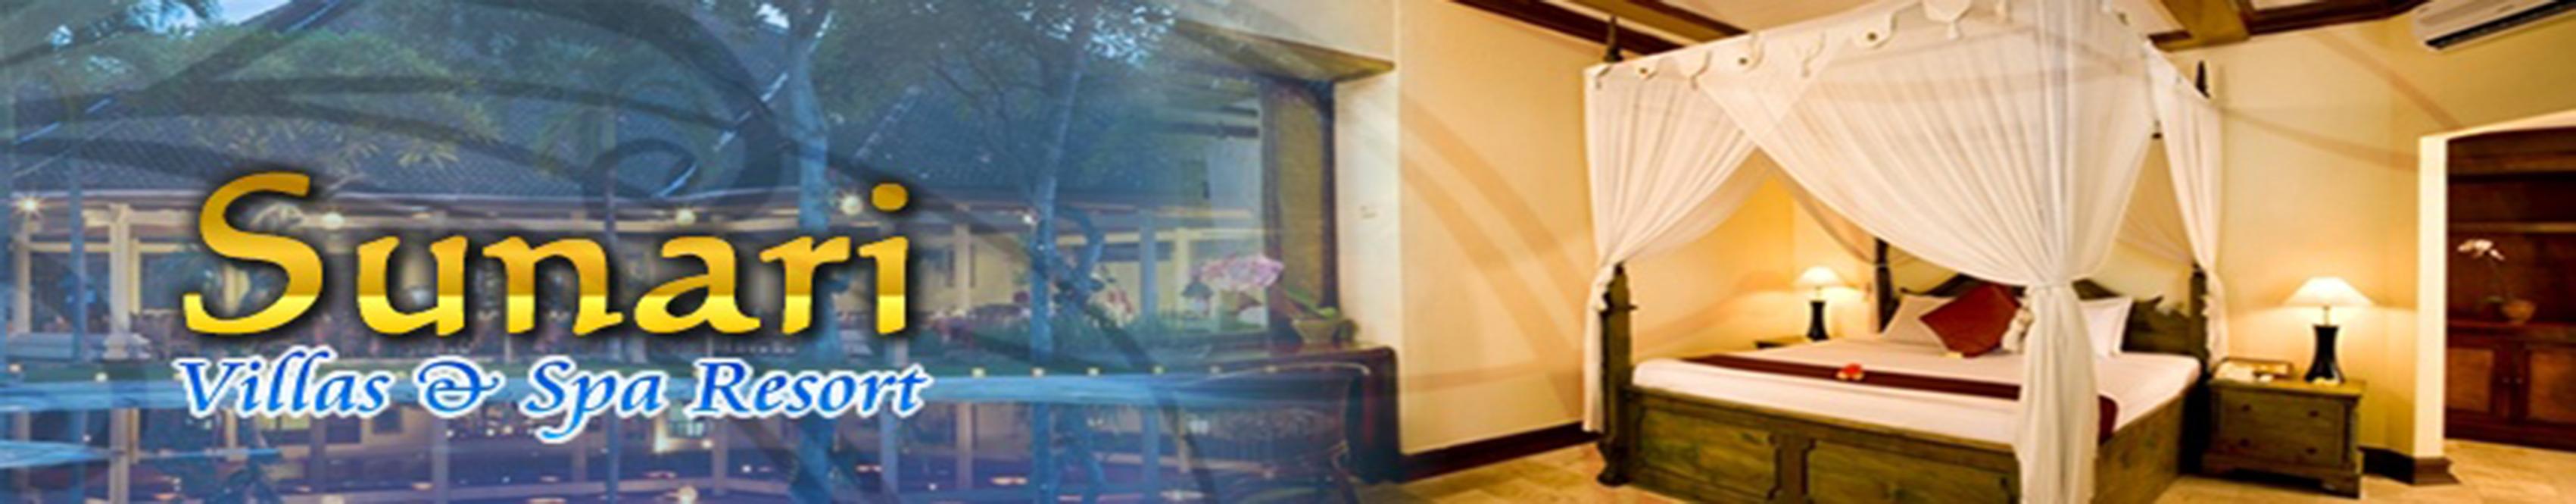 Sunari Villas & Spa Resort